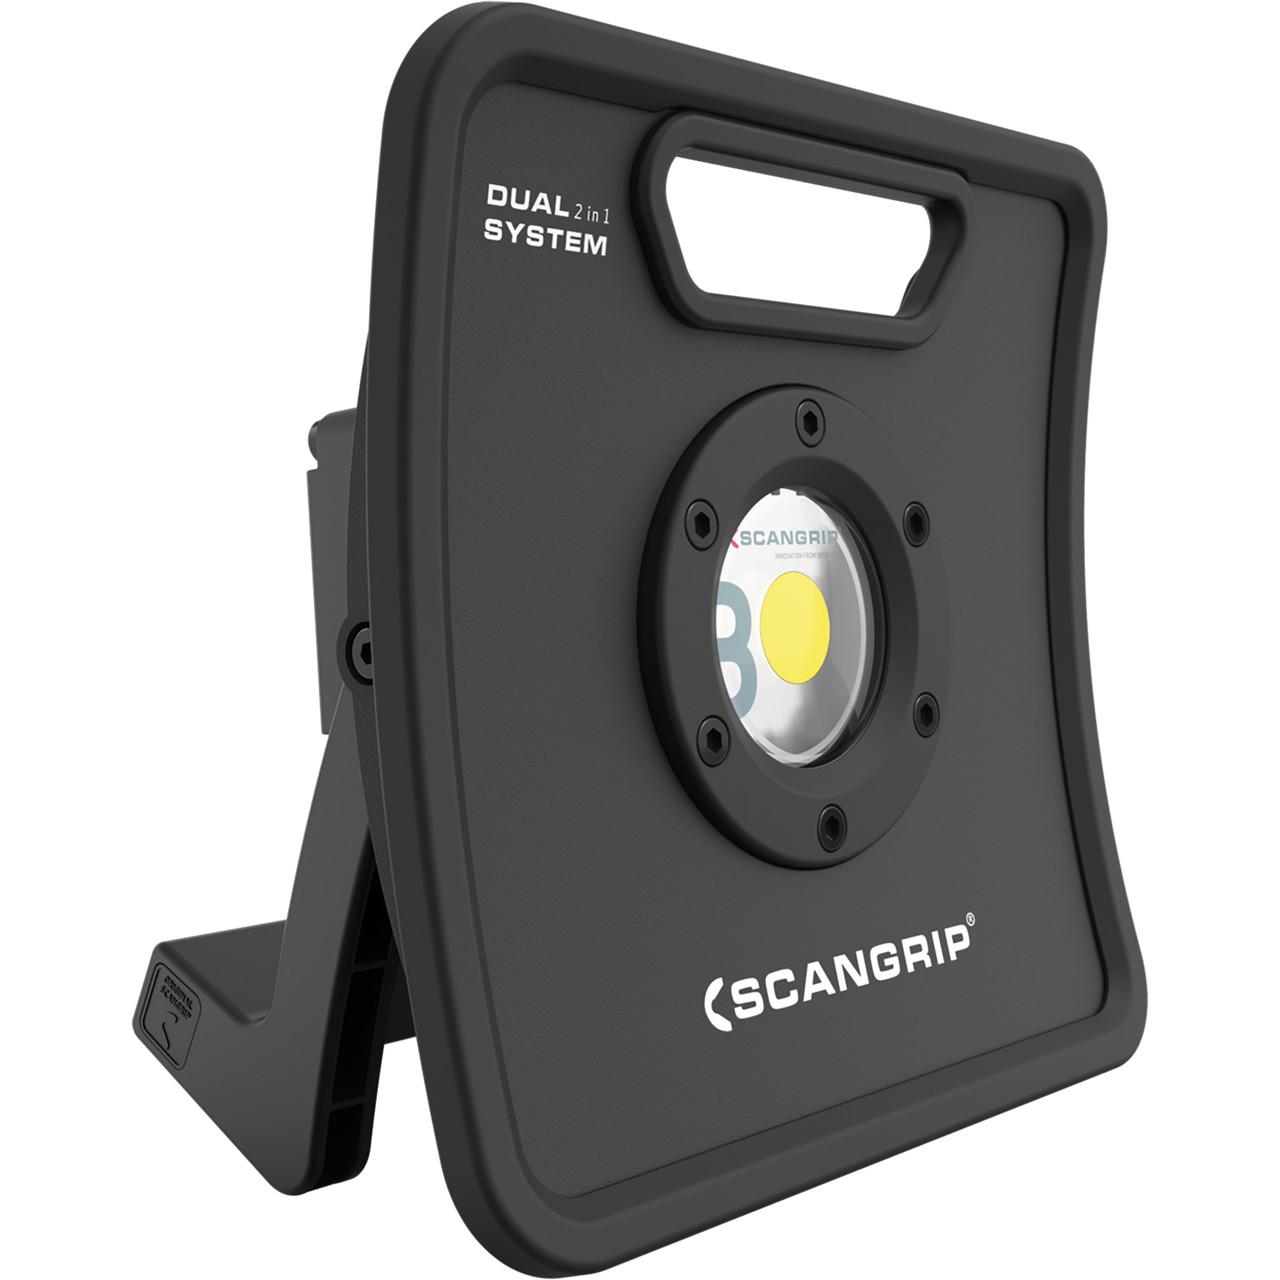 Scangrip Arbejdslampe NOVA 3K C+R 3000 lumen - Diverse -> Byggepladsbelysning -> Arbejdslamper|Diverse -> Byggepladsbelysning|Diverse|Mærker -> Scangrip